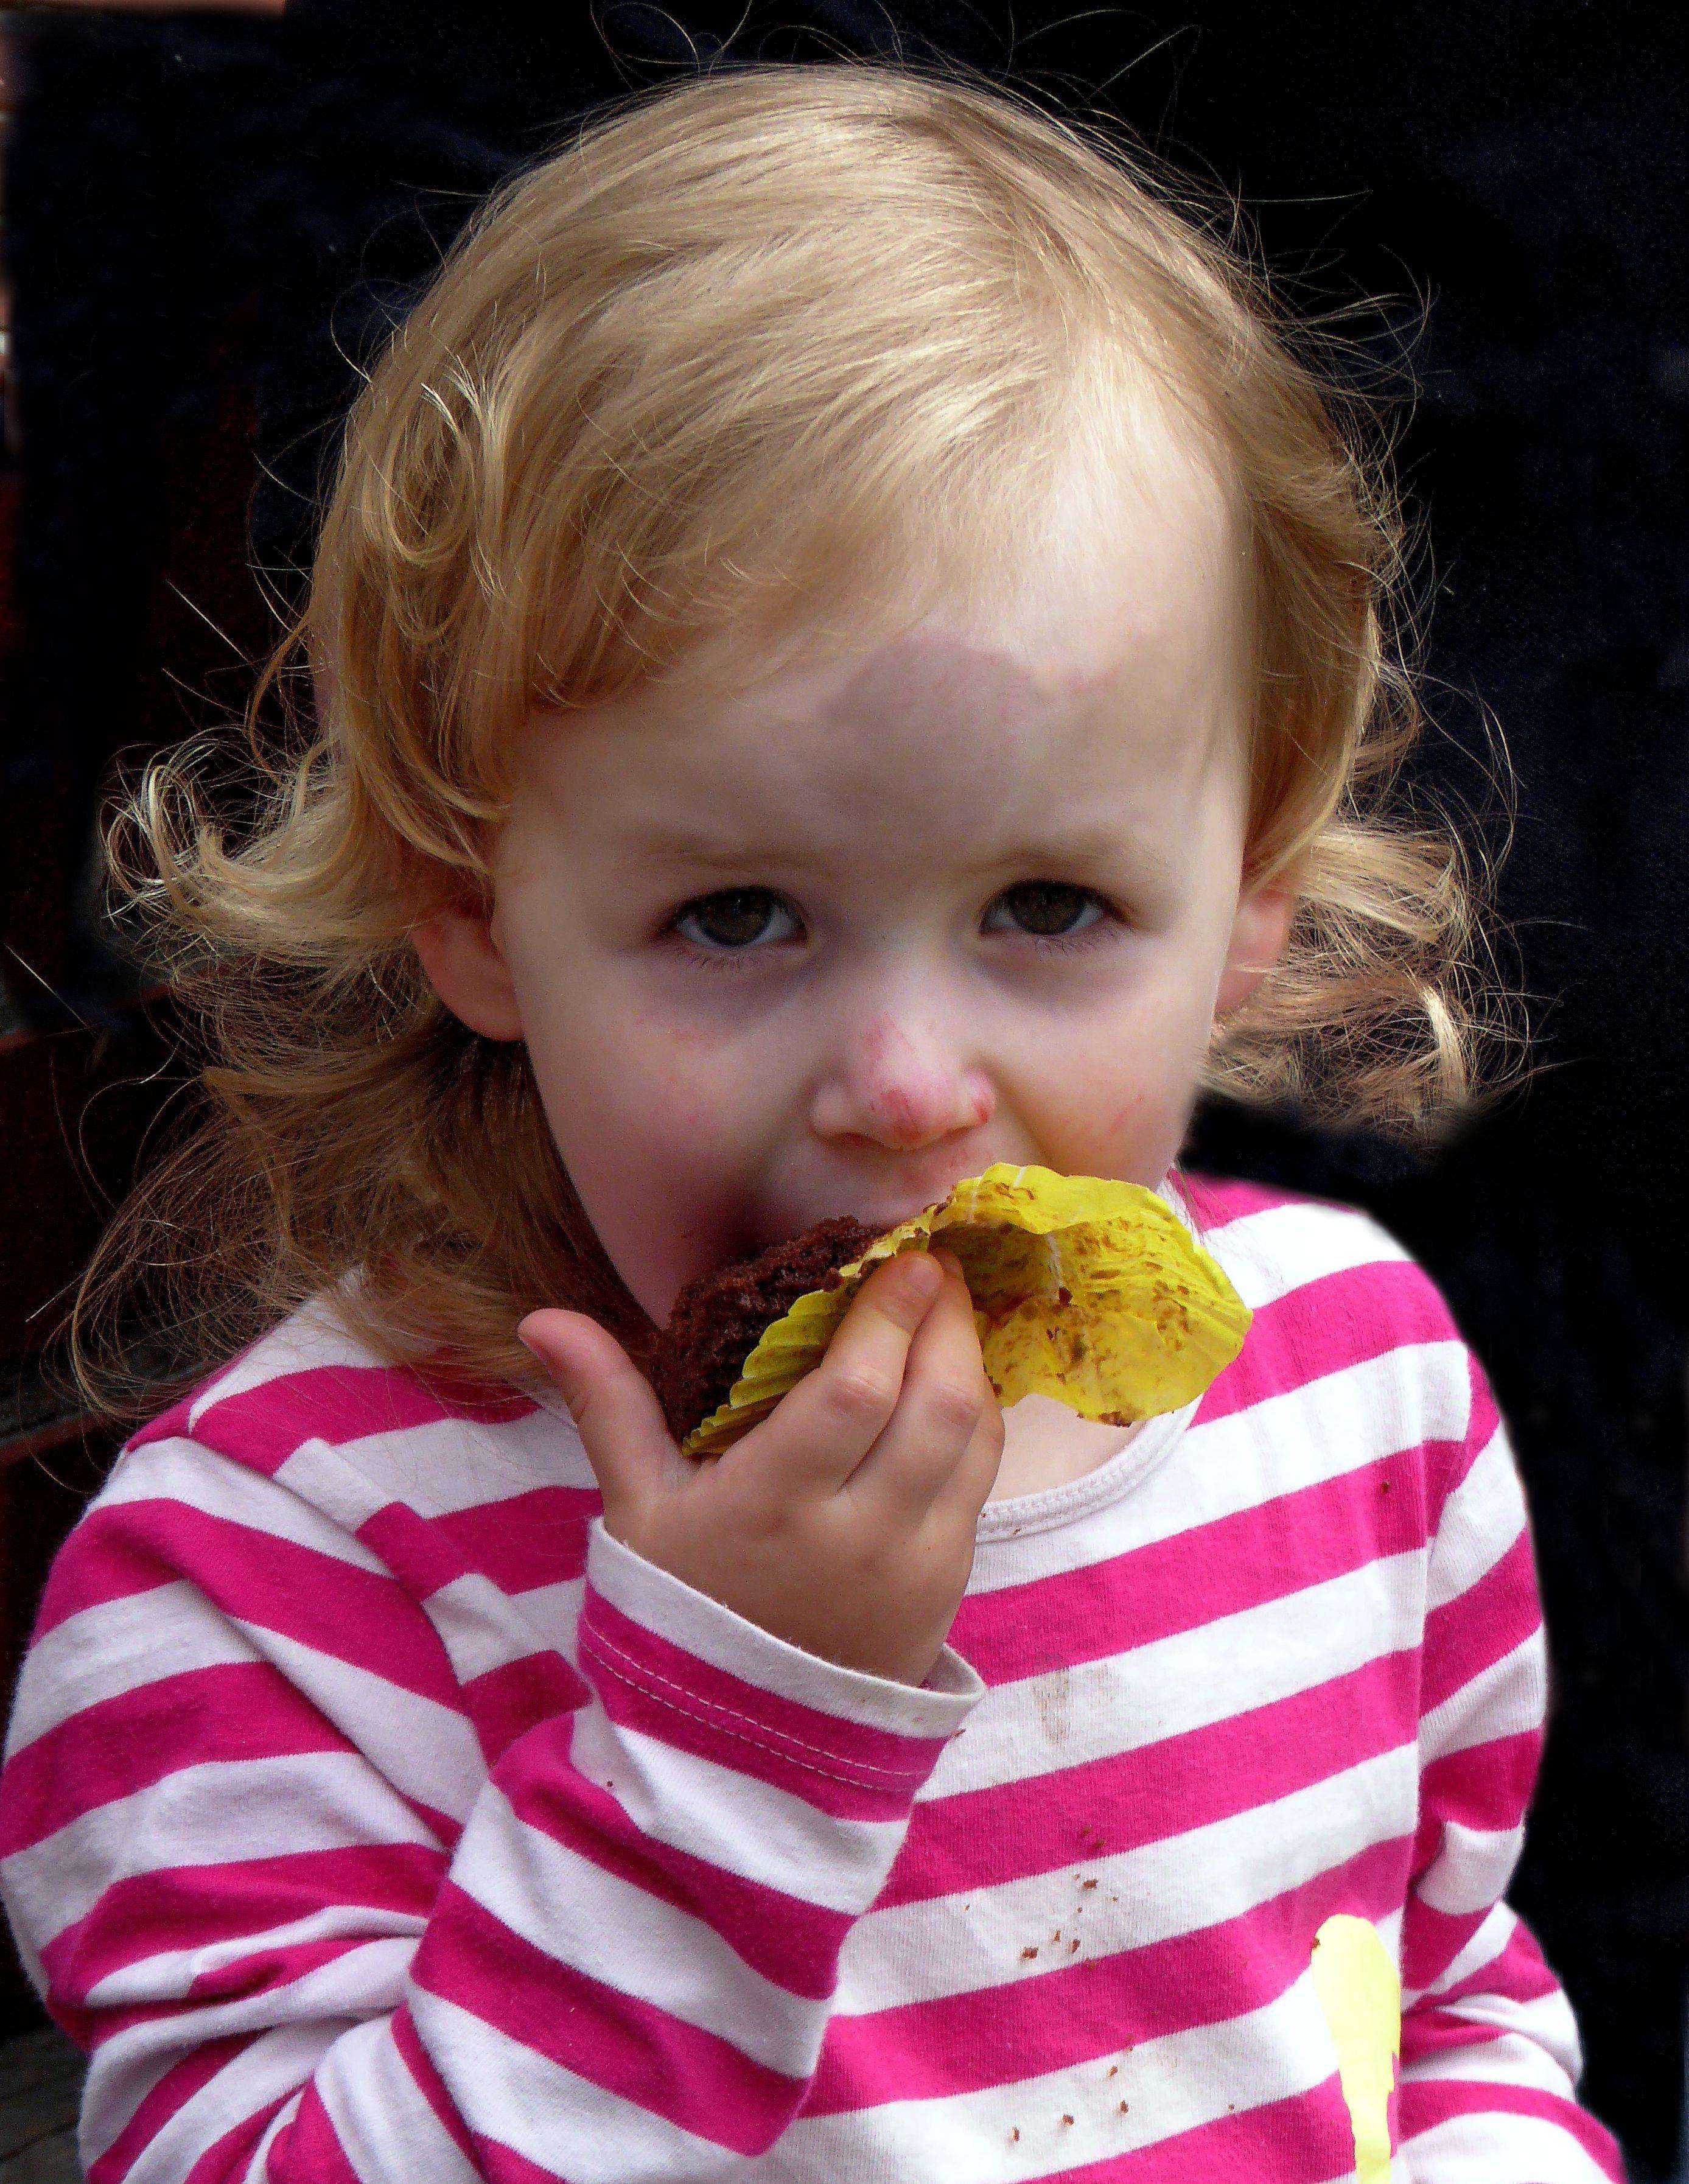 kostenlose foto person haar niedlich portrà t kind rosa